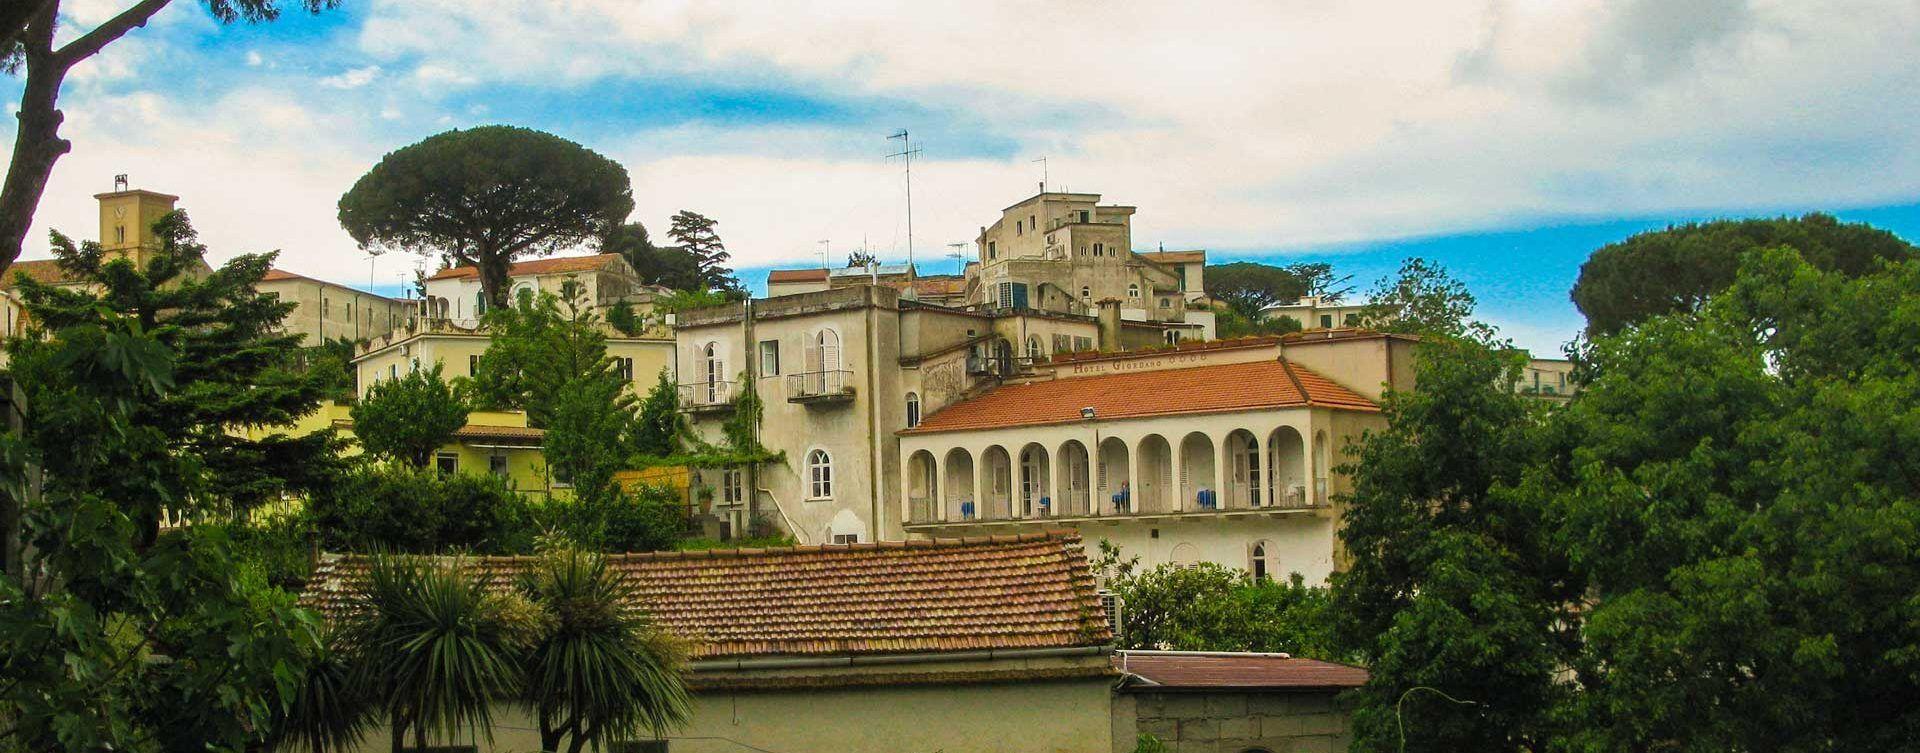 ravello panoramic travelshare.gr